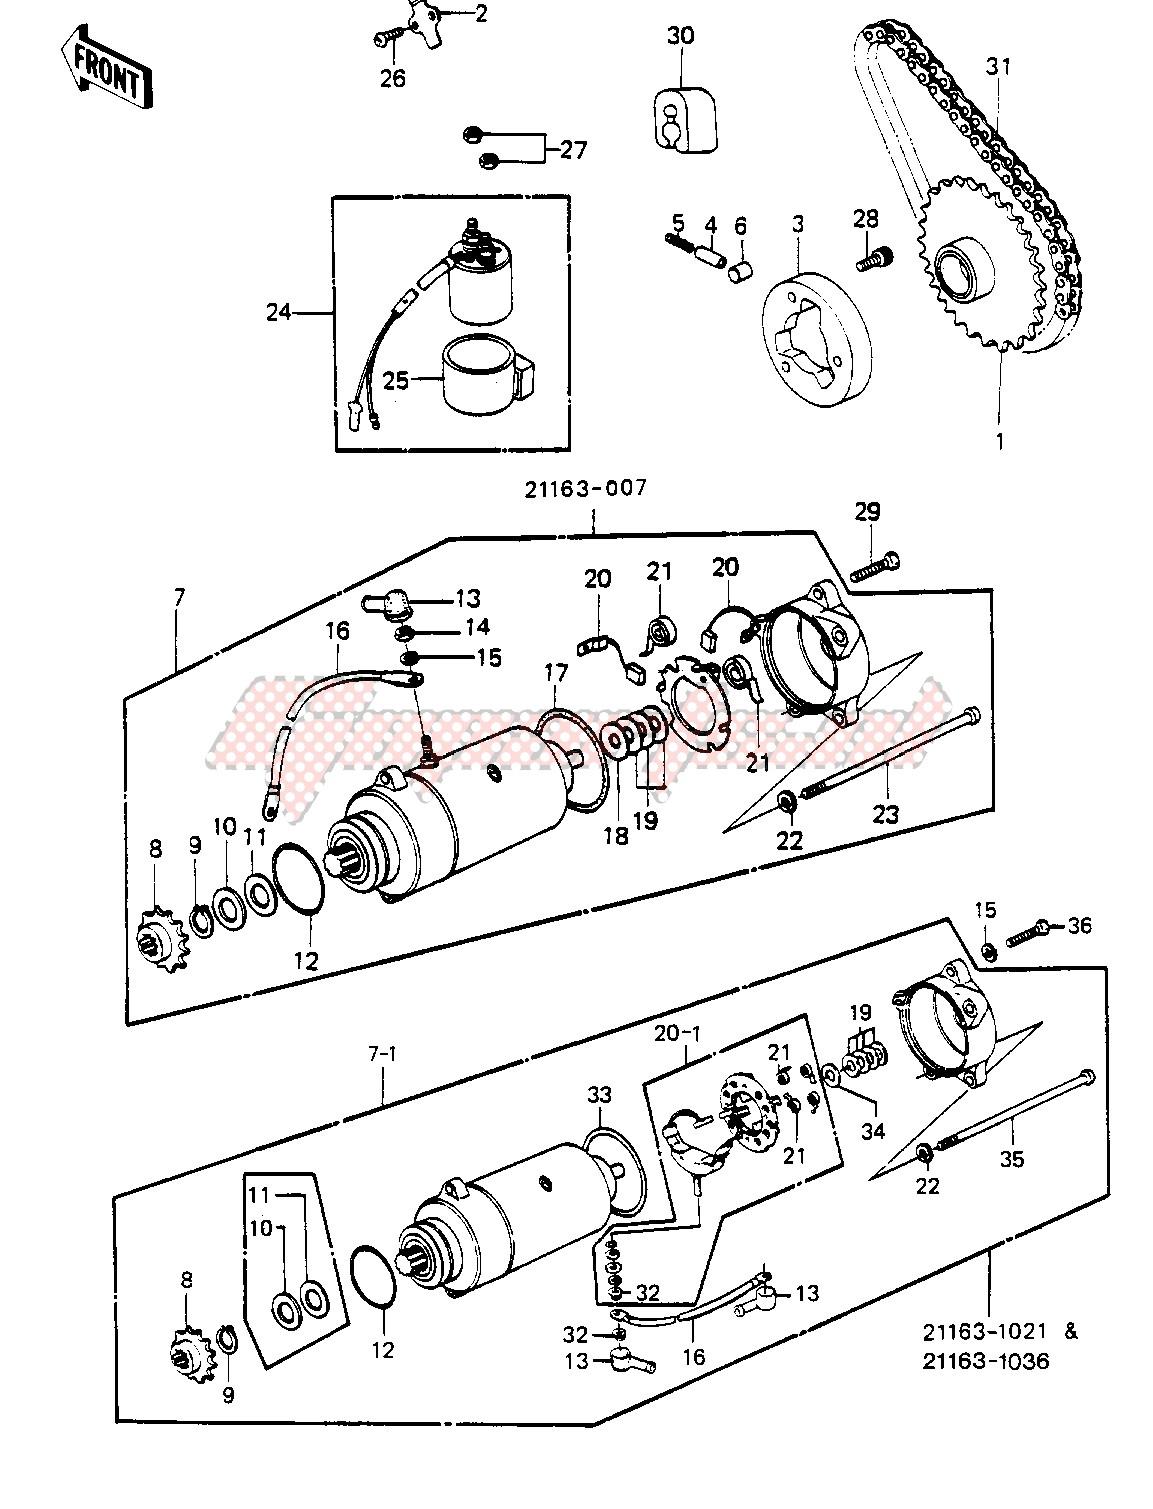 STARTER MOTOR_STARTER CLUTCH image